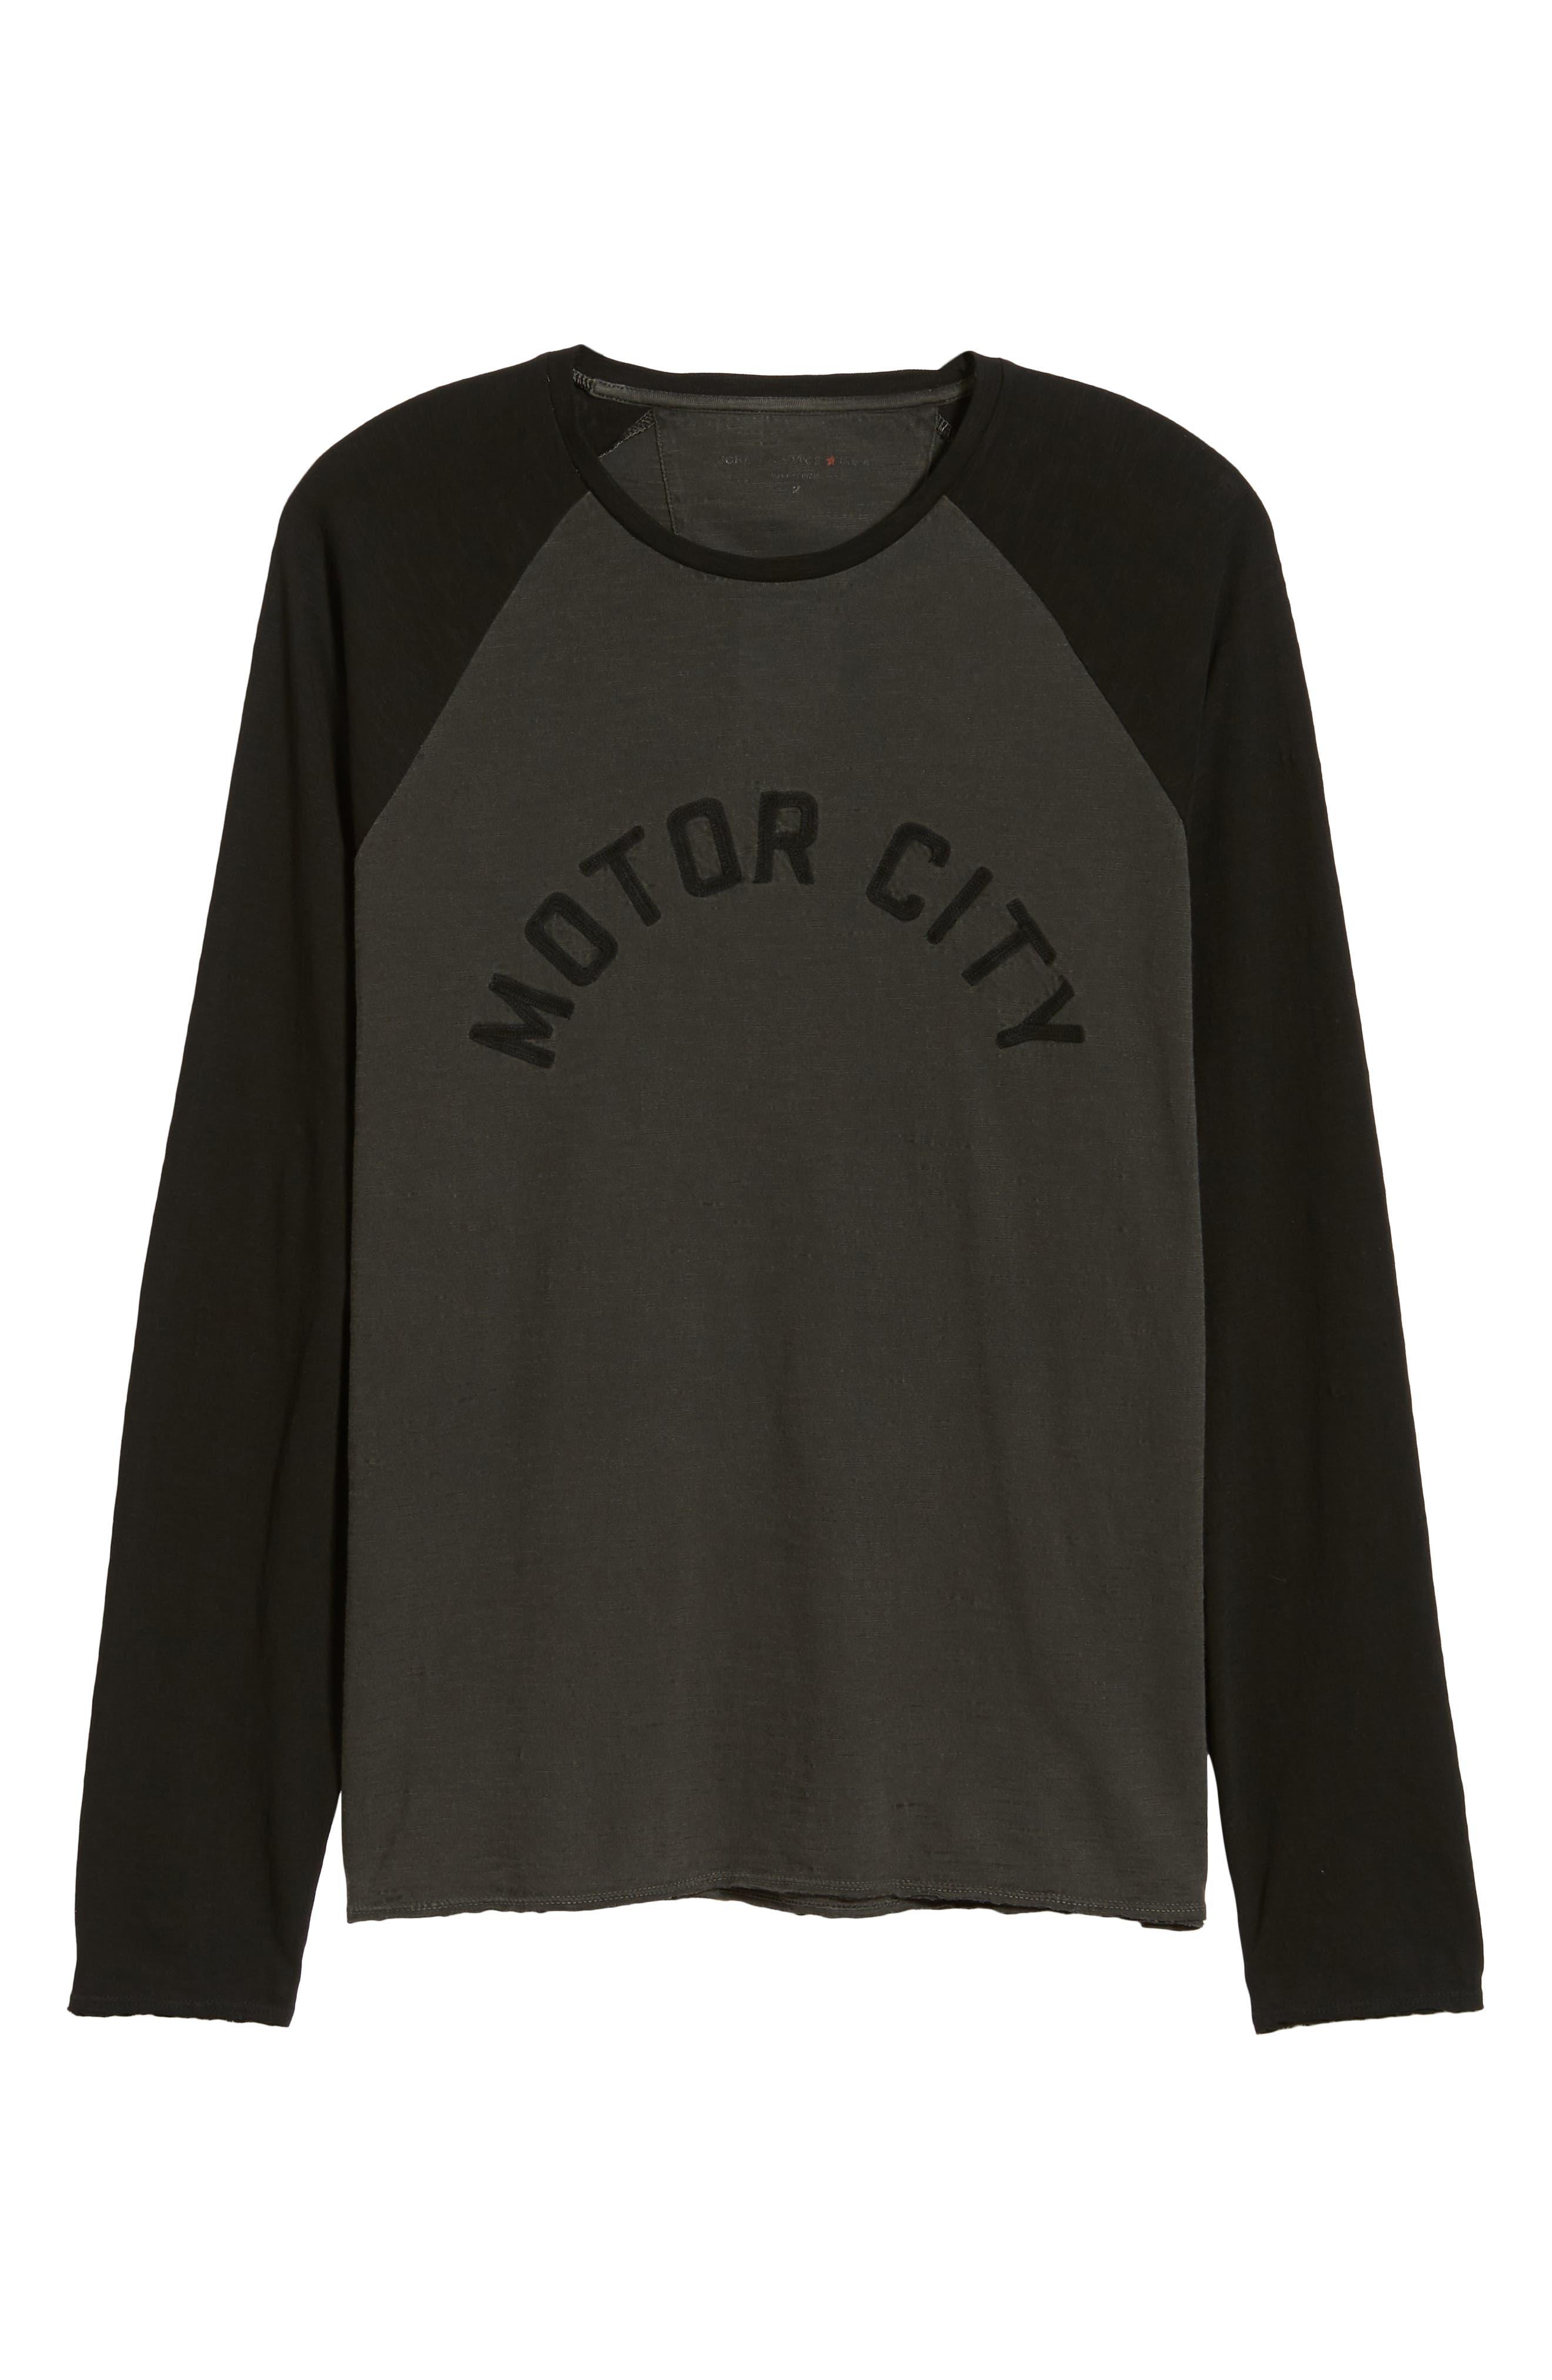 Motor City Long Sleeve T-Shirt,                             Alternate thumbnail 6, color,                             COAL